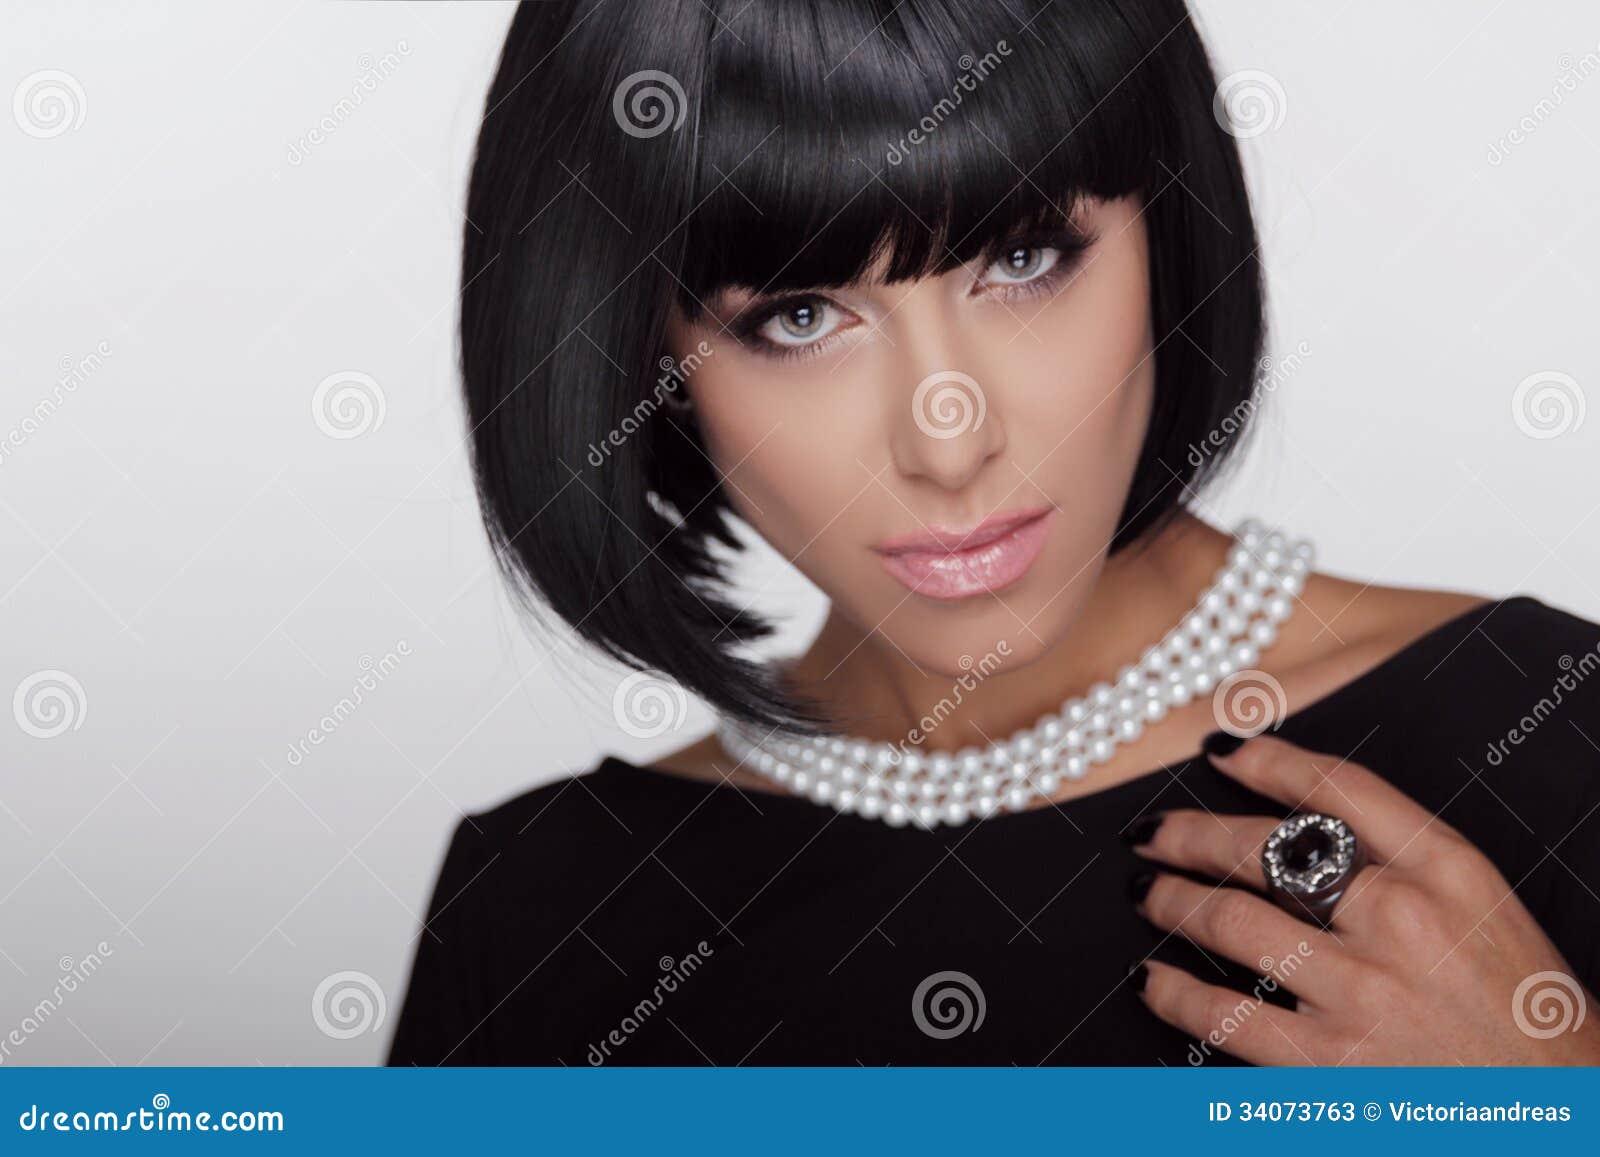 Style De Vogue. Coupe De Cheveux De Mode. Coiffure. Photos stock ...